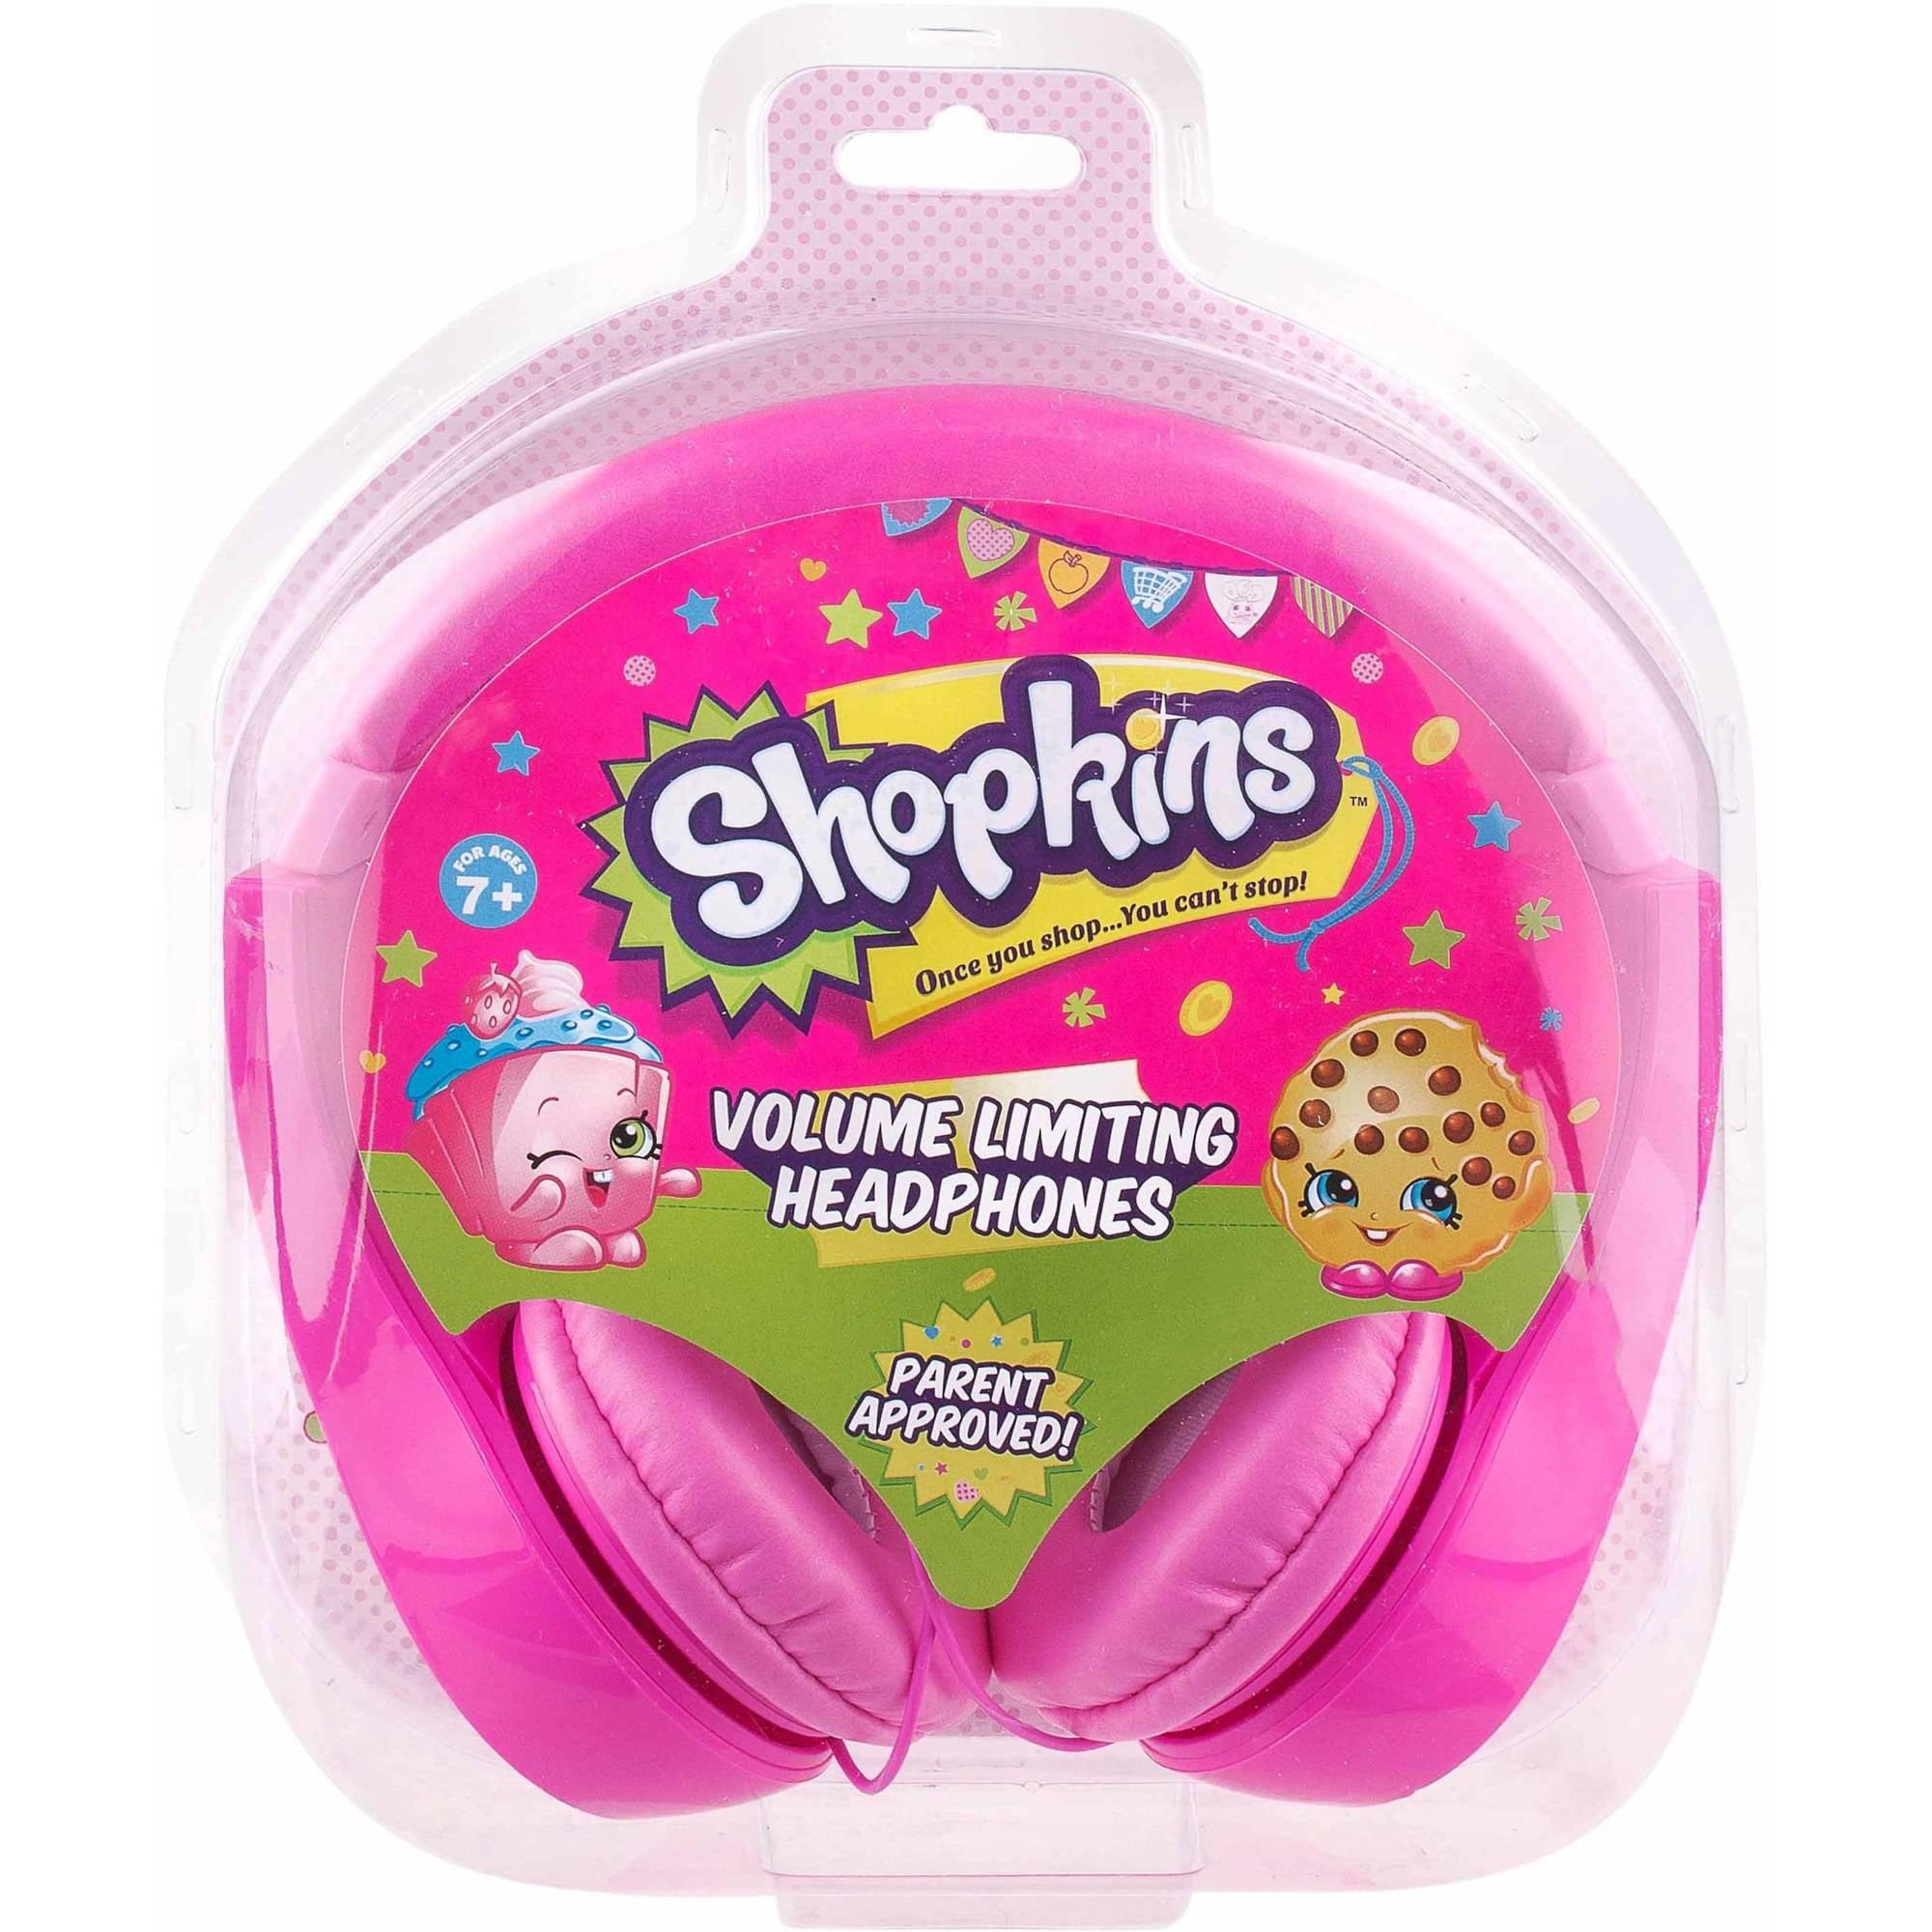 Shopkins Kids-Friendly Headphones